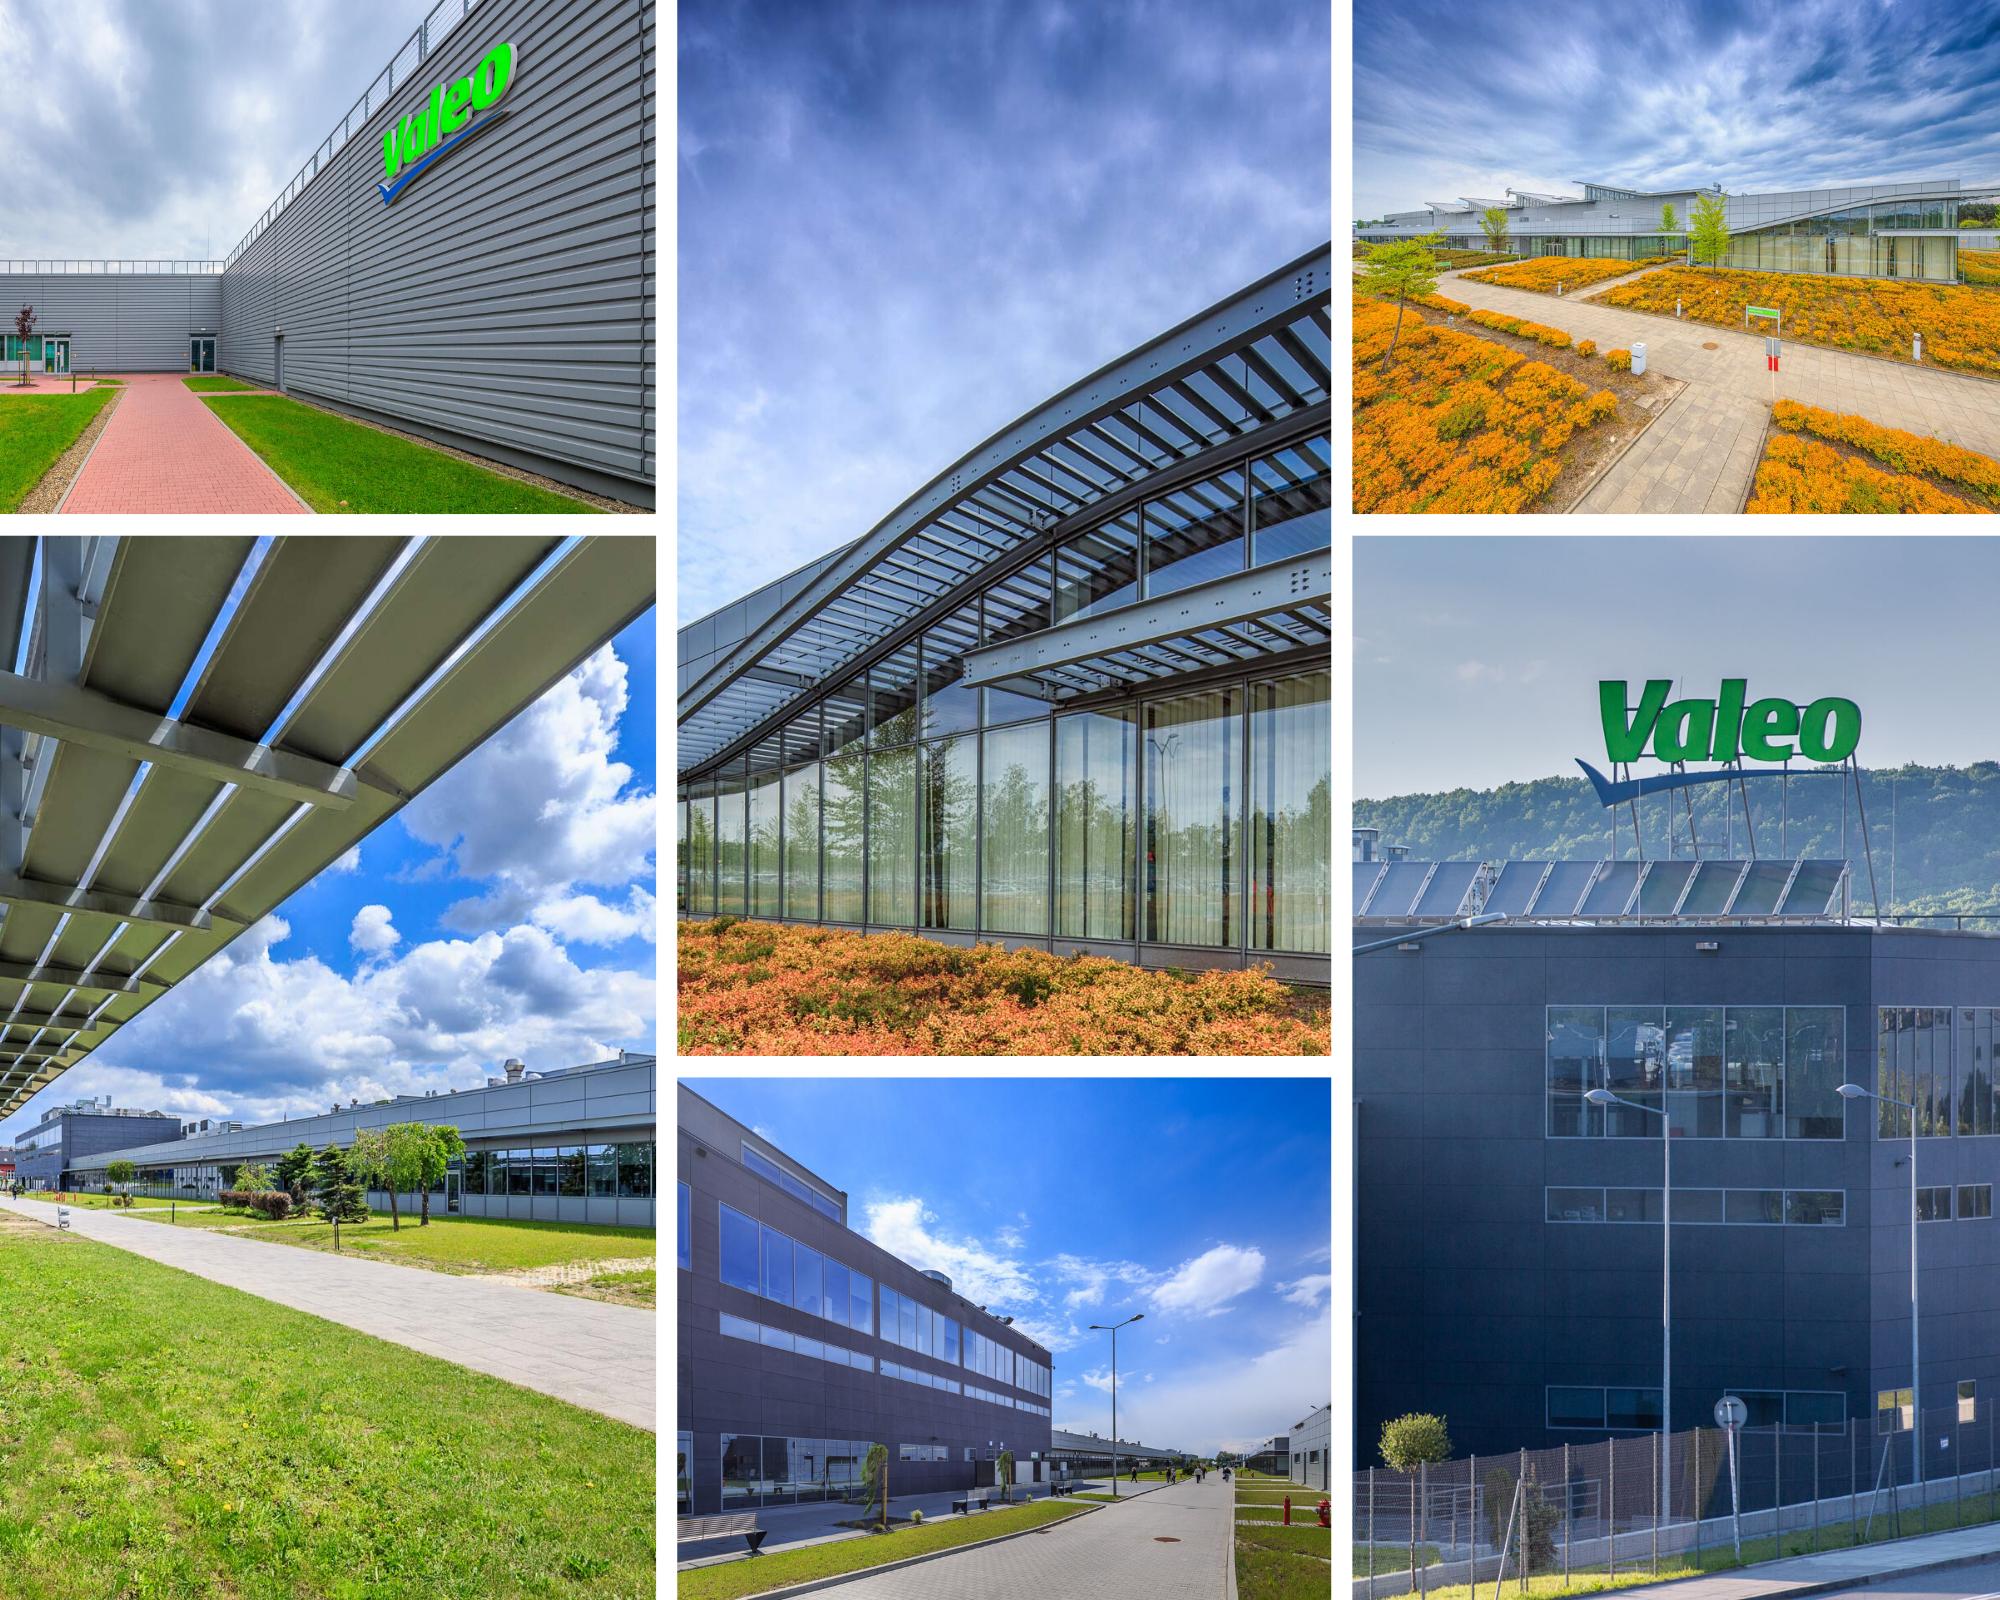 photo collage of Valeo plant in Poland Skawina